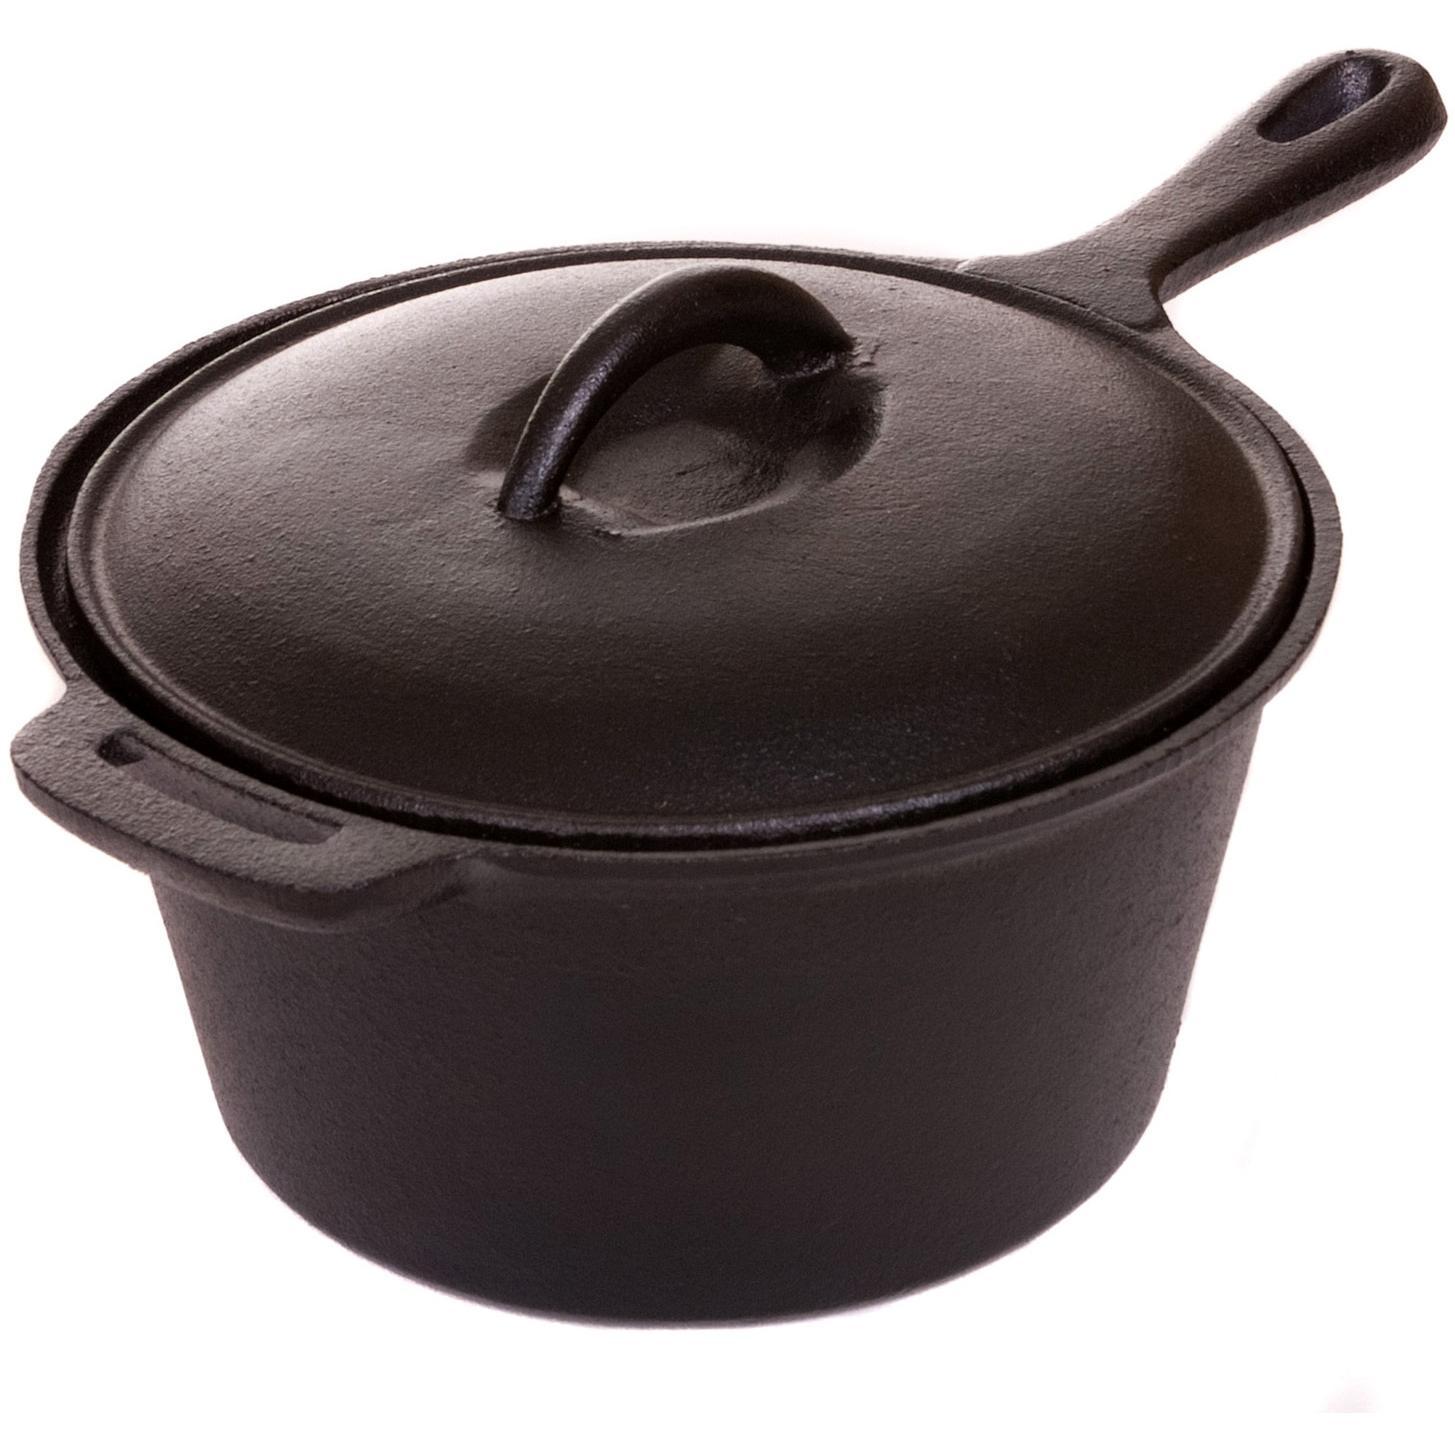 Picture of Cajun Cookware 1 1/2-Quart Seasoned Cast Iron Sauce Pot - GL10491AS